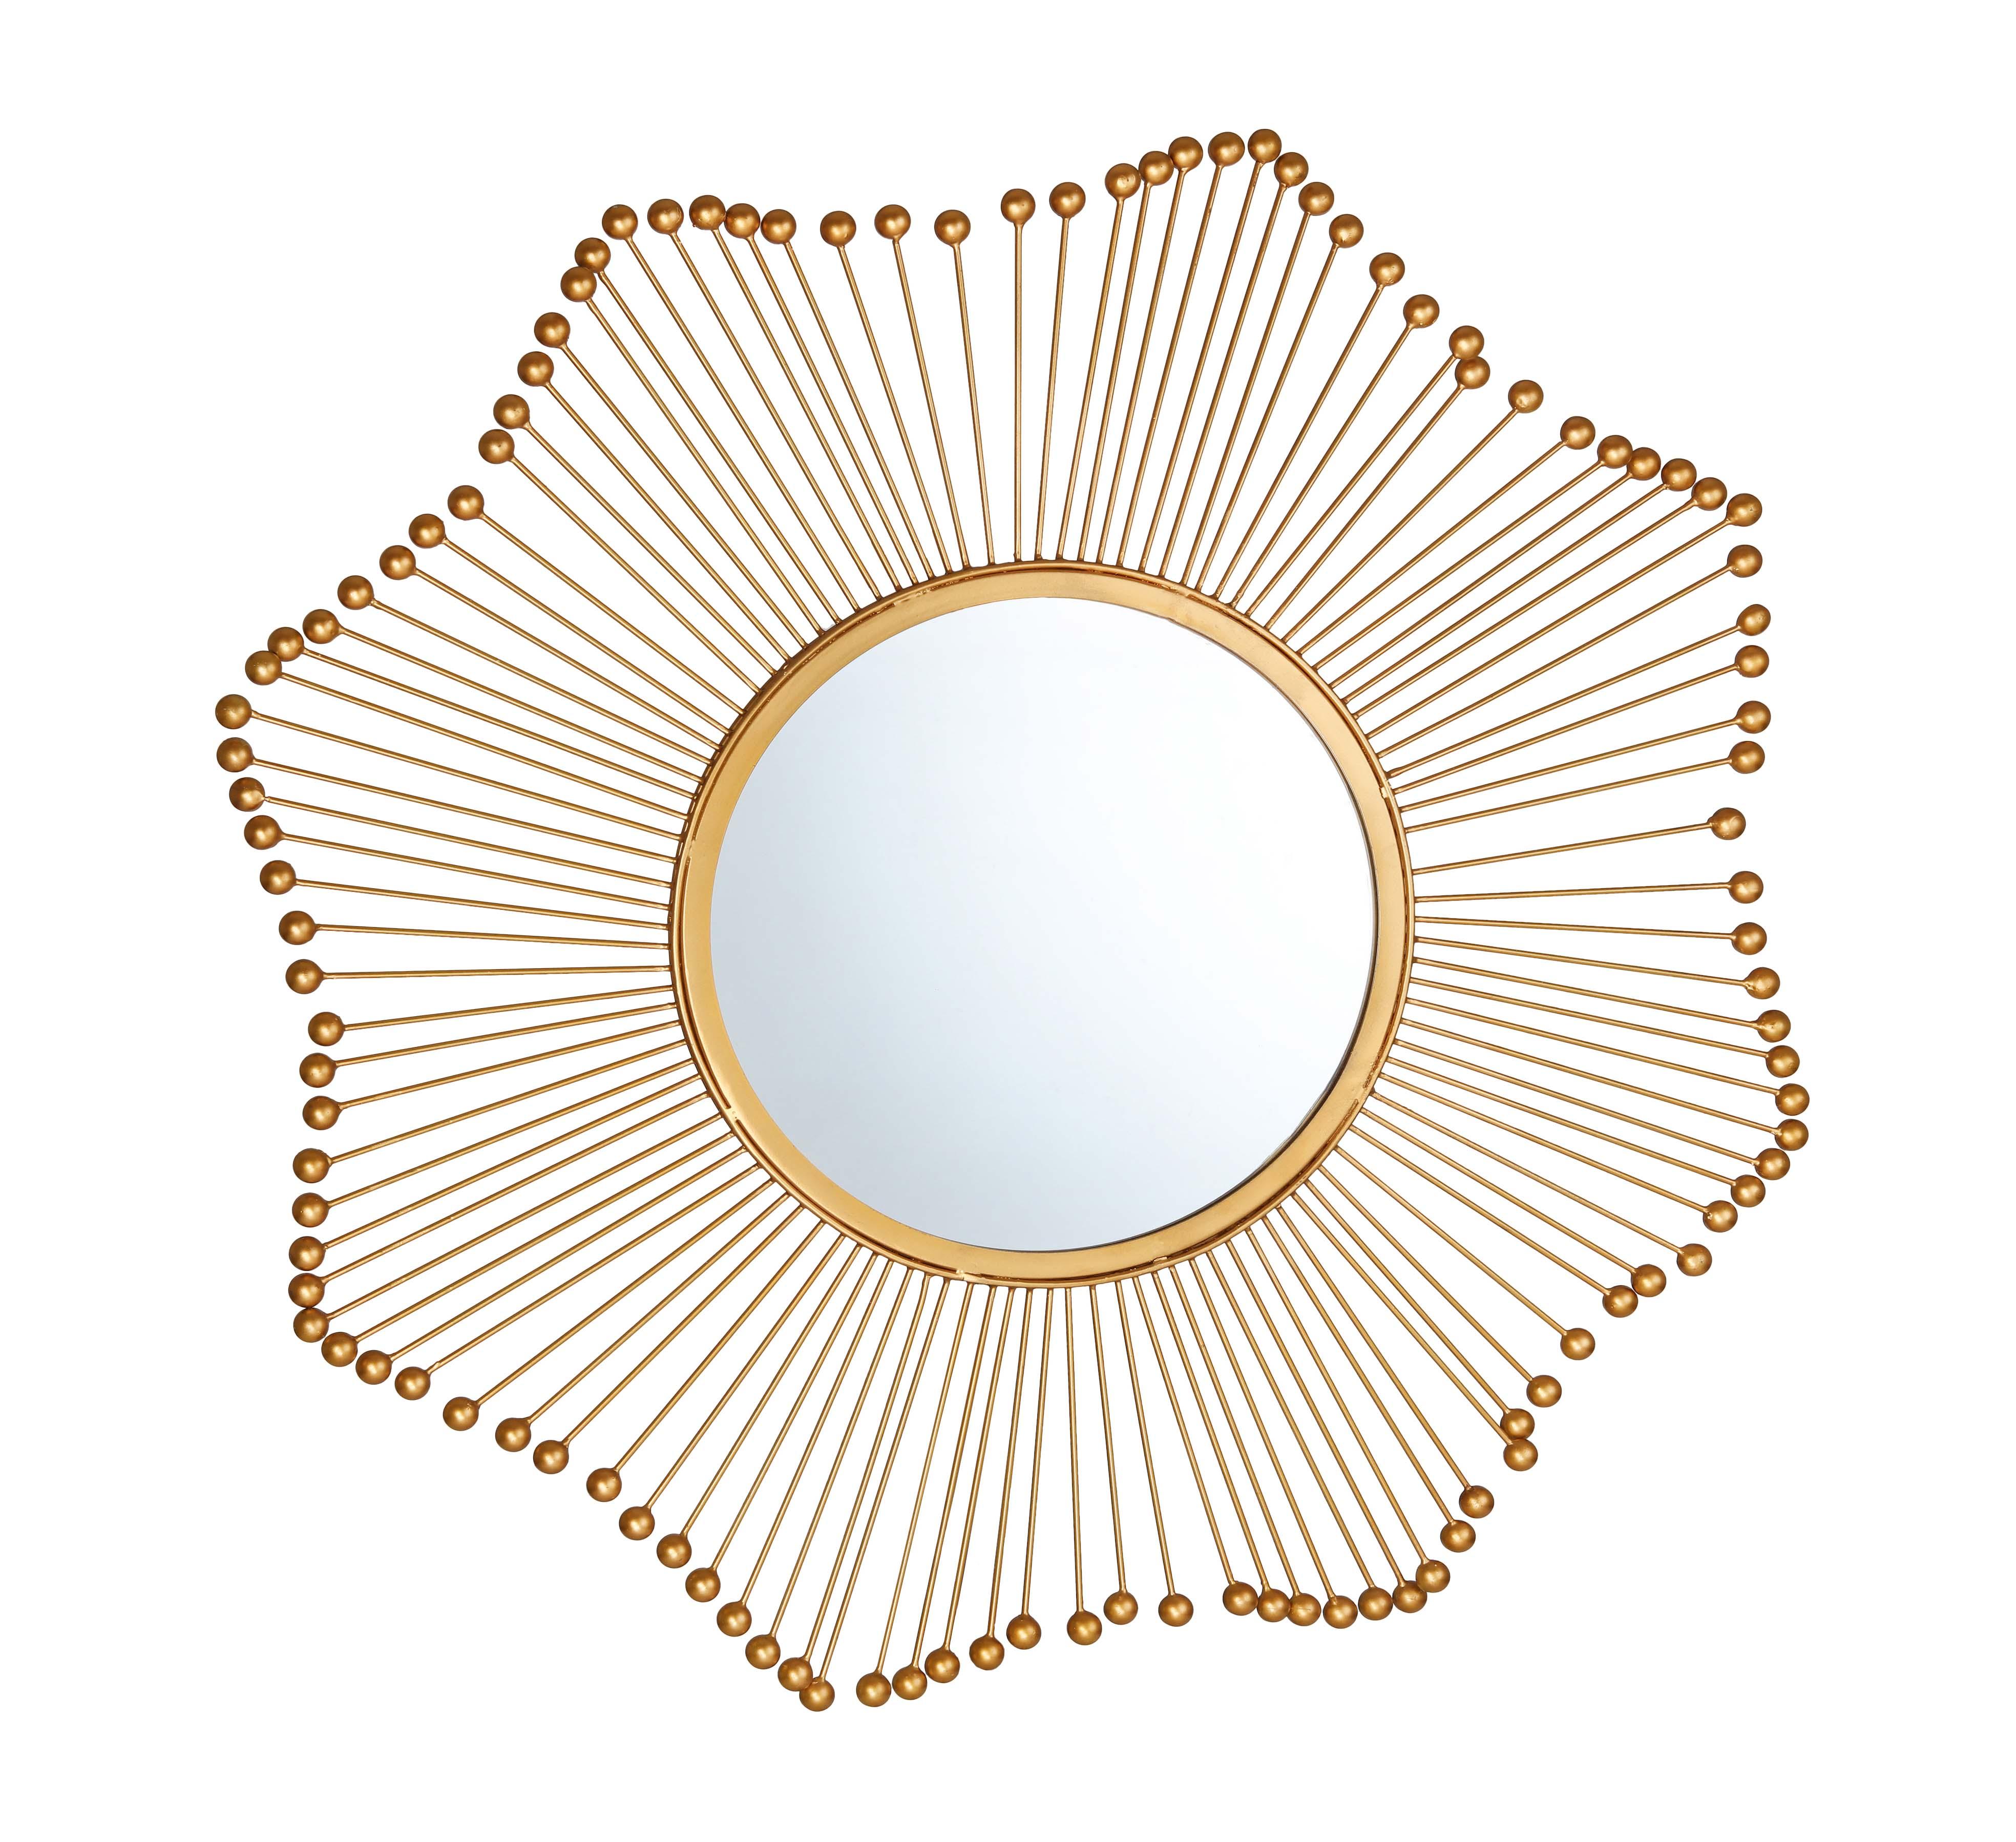 Sol Gold Mirror